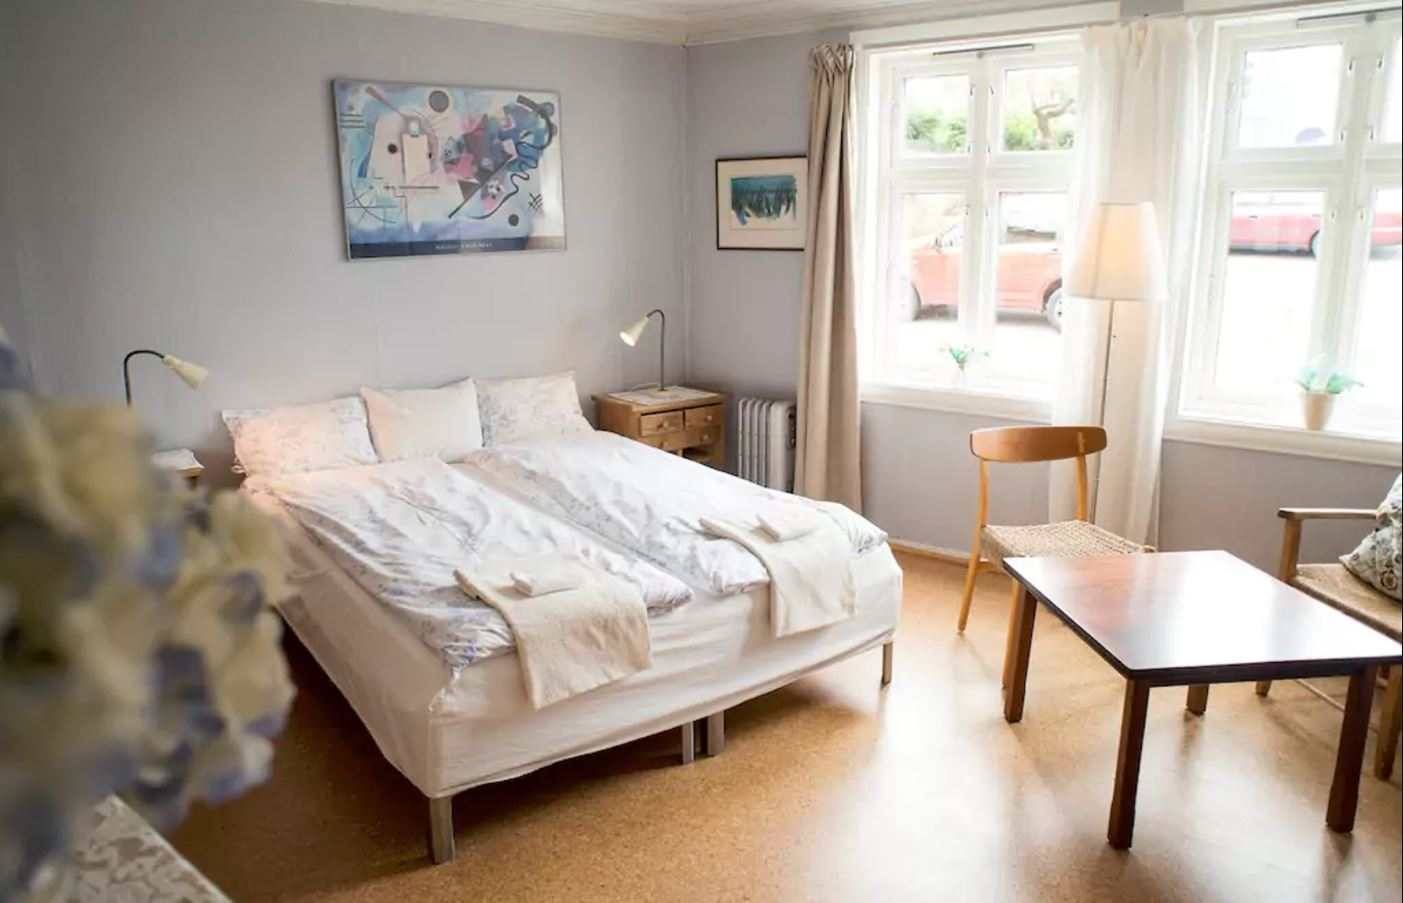 Location Appartement Bergen Norvege